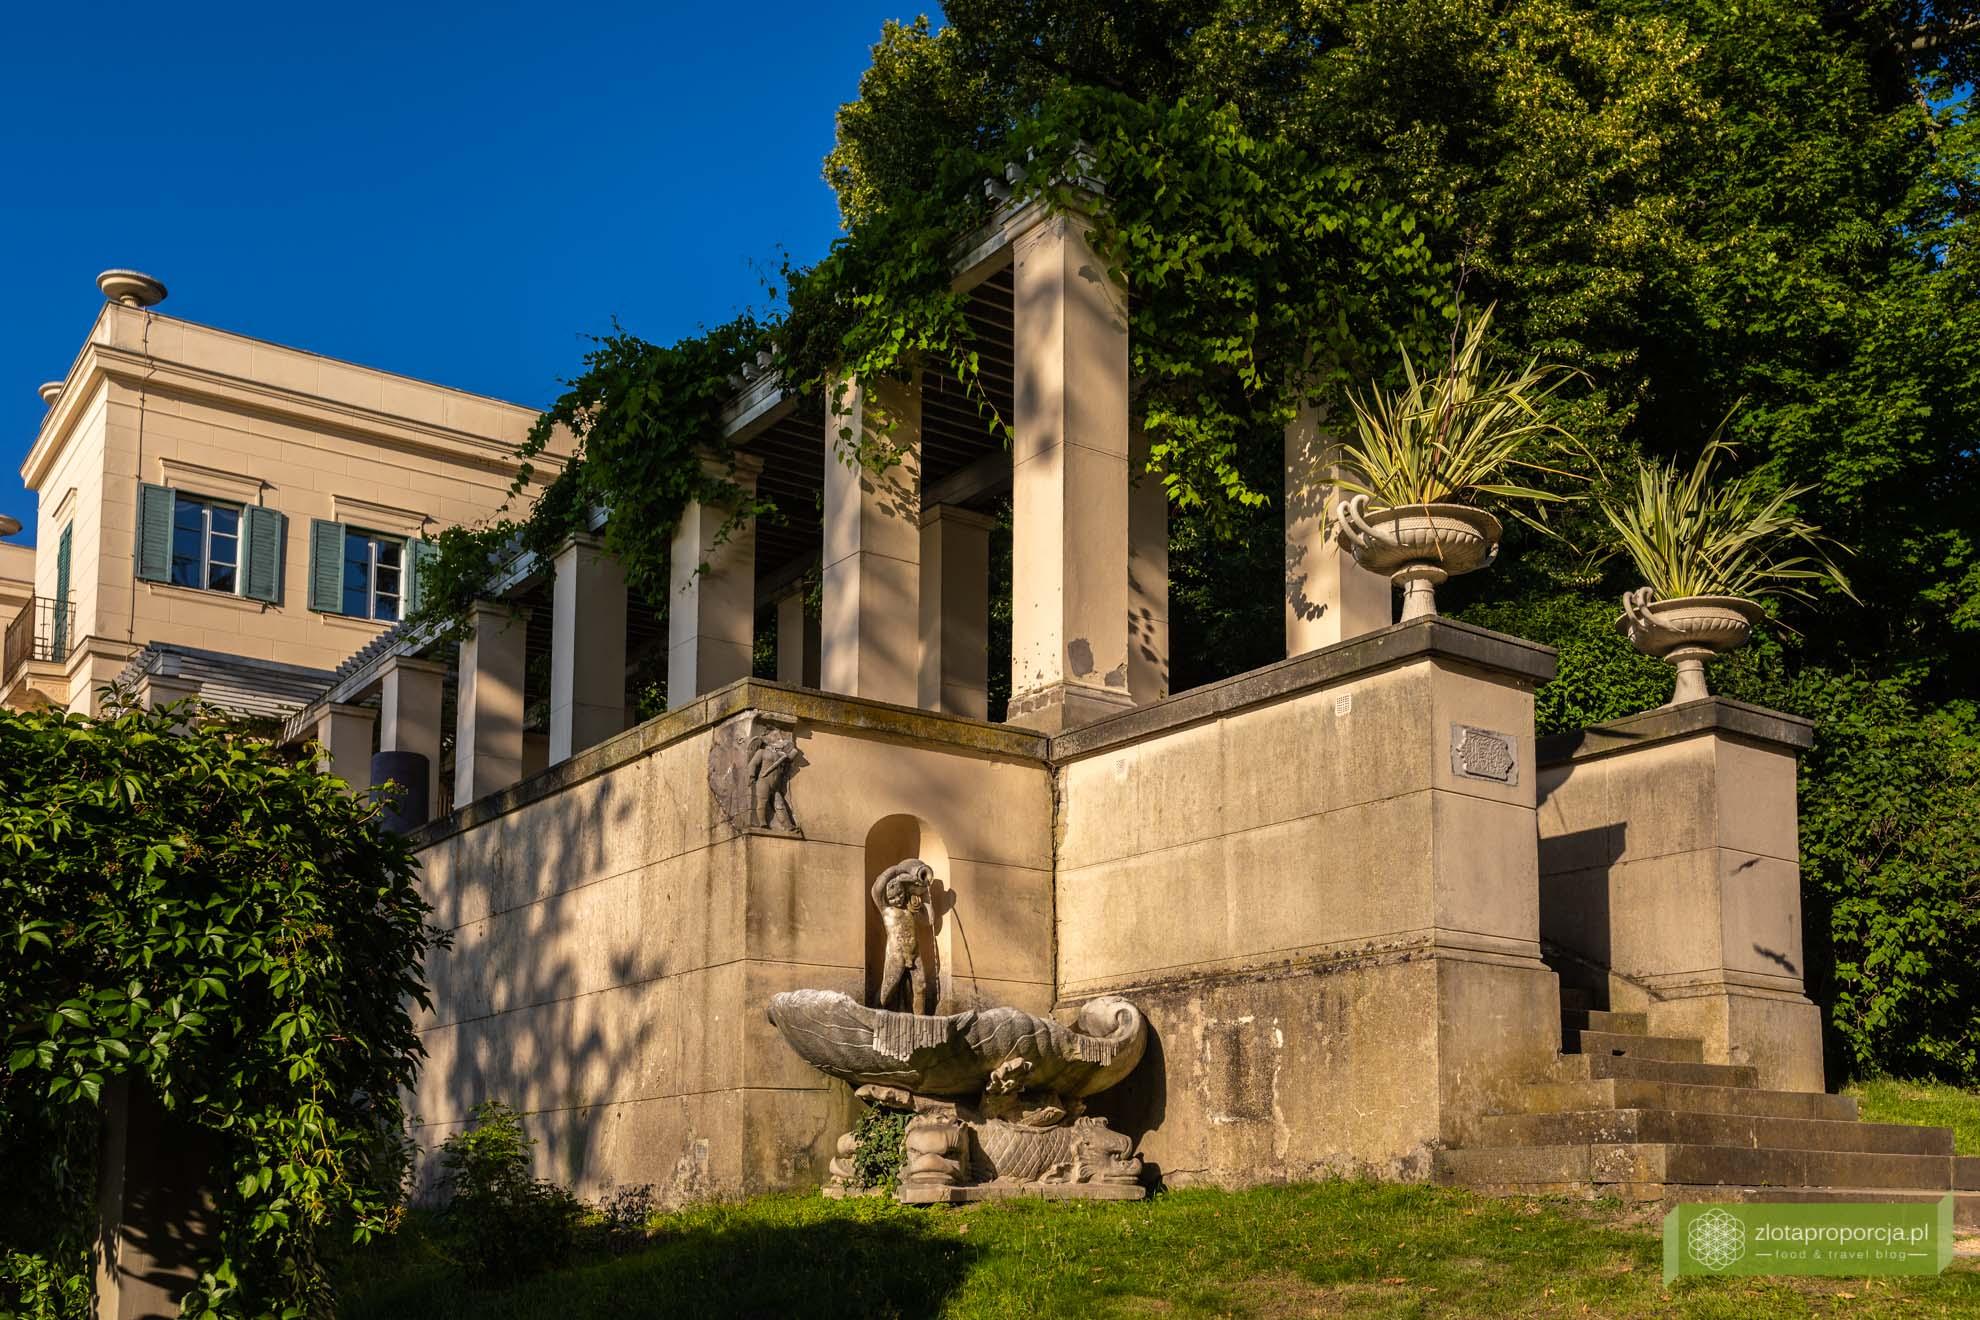 Berlin; Steglitz-Zehlendorf; atrakcje Berlina; Unesco; Berlin Unesco; Park Glienicke; Glienicke; Pałac Glienicke;